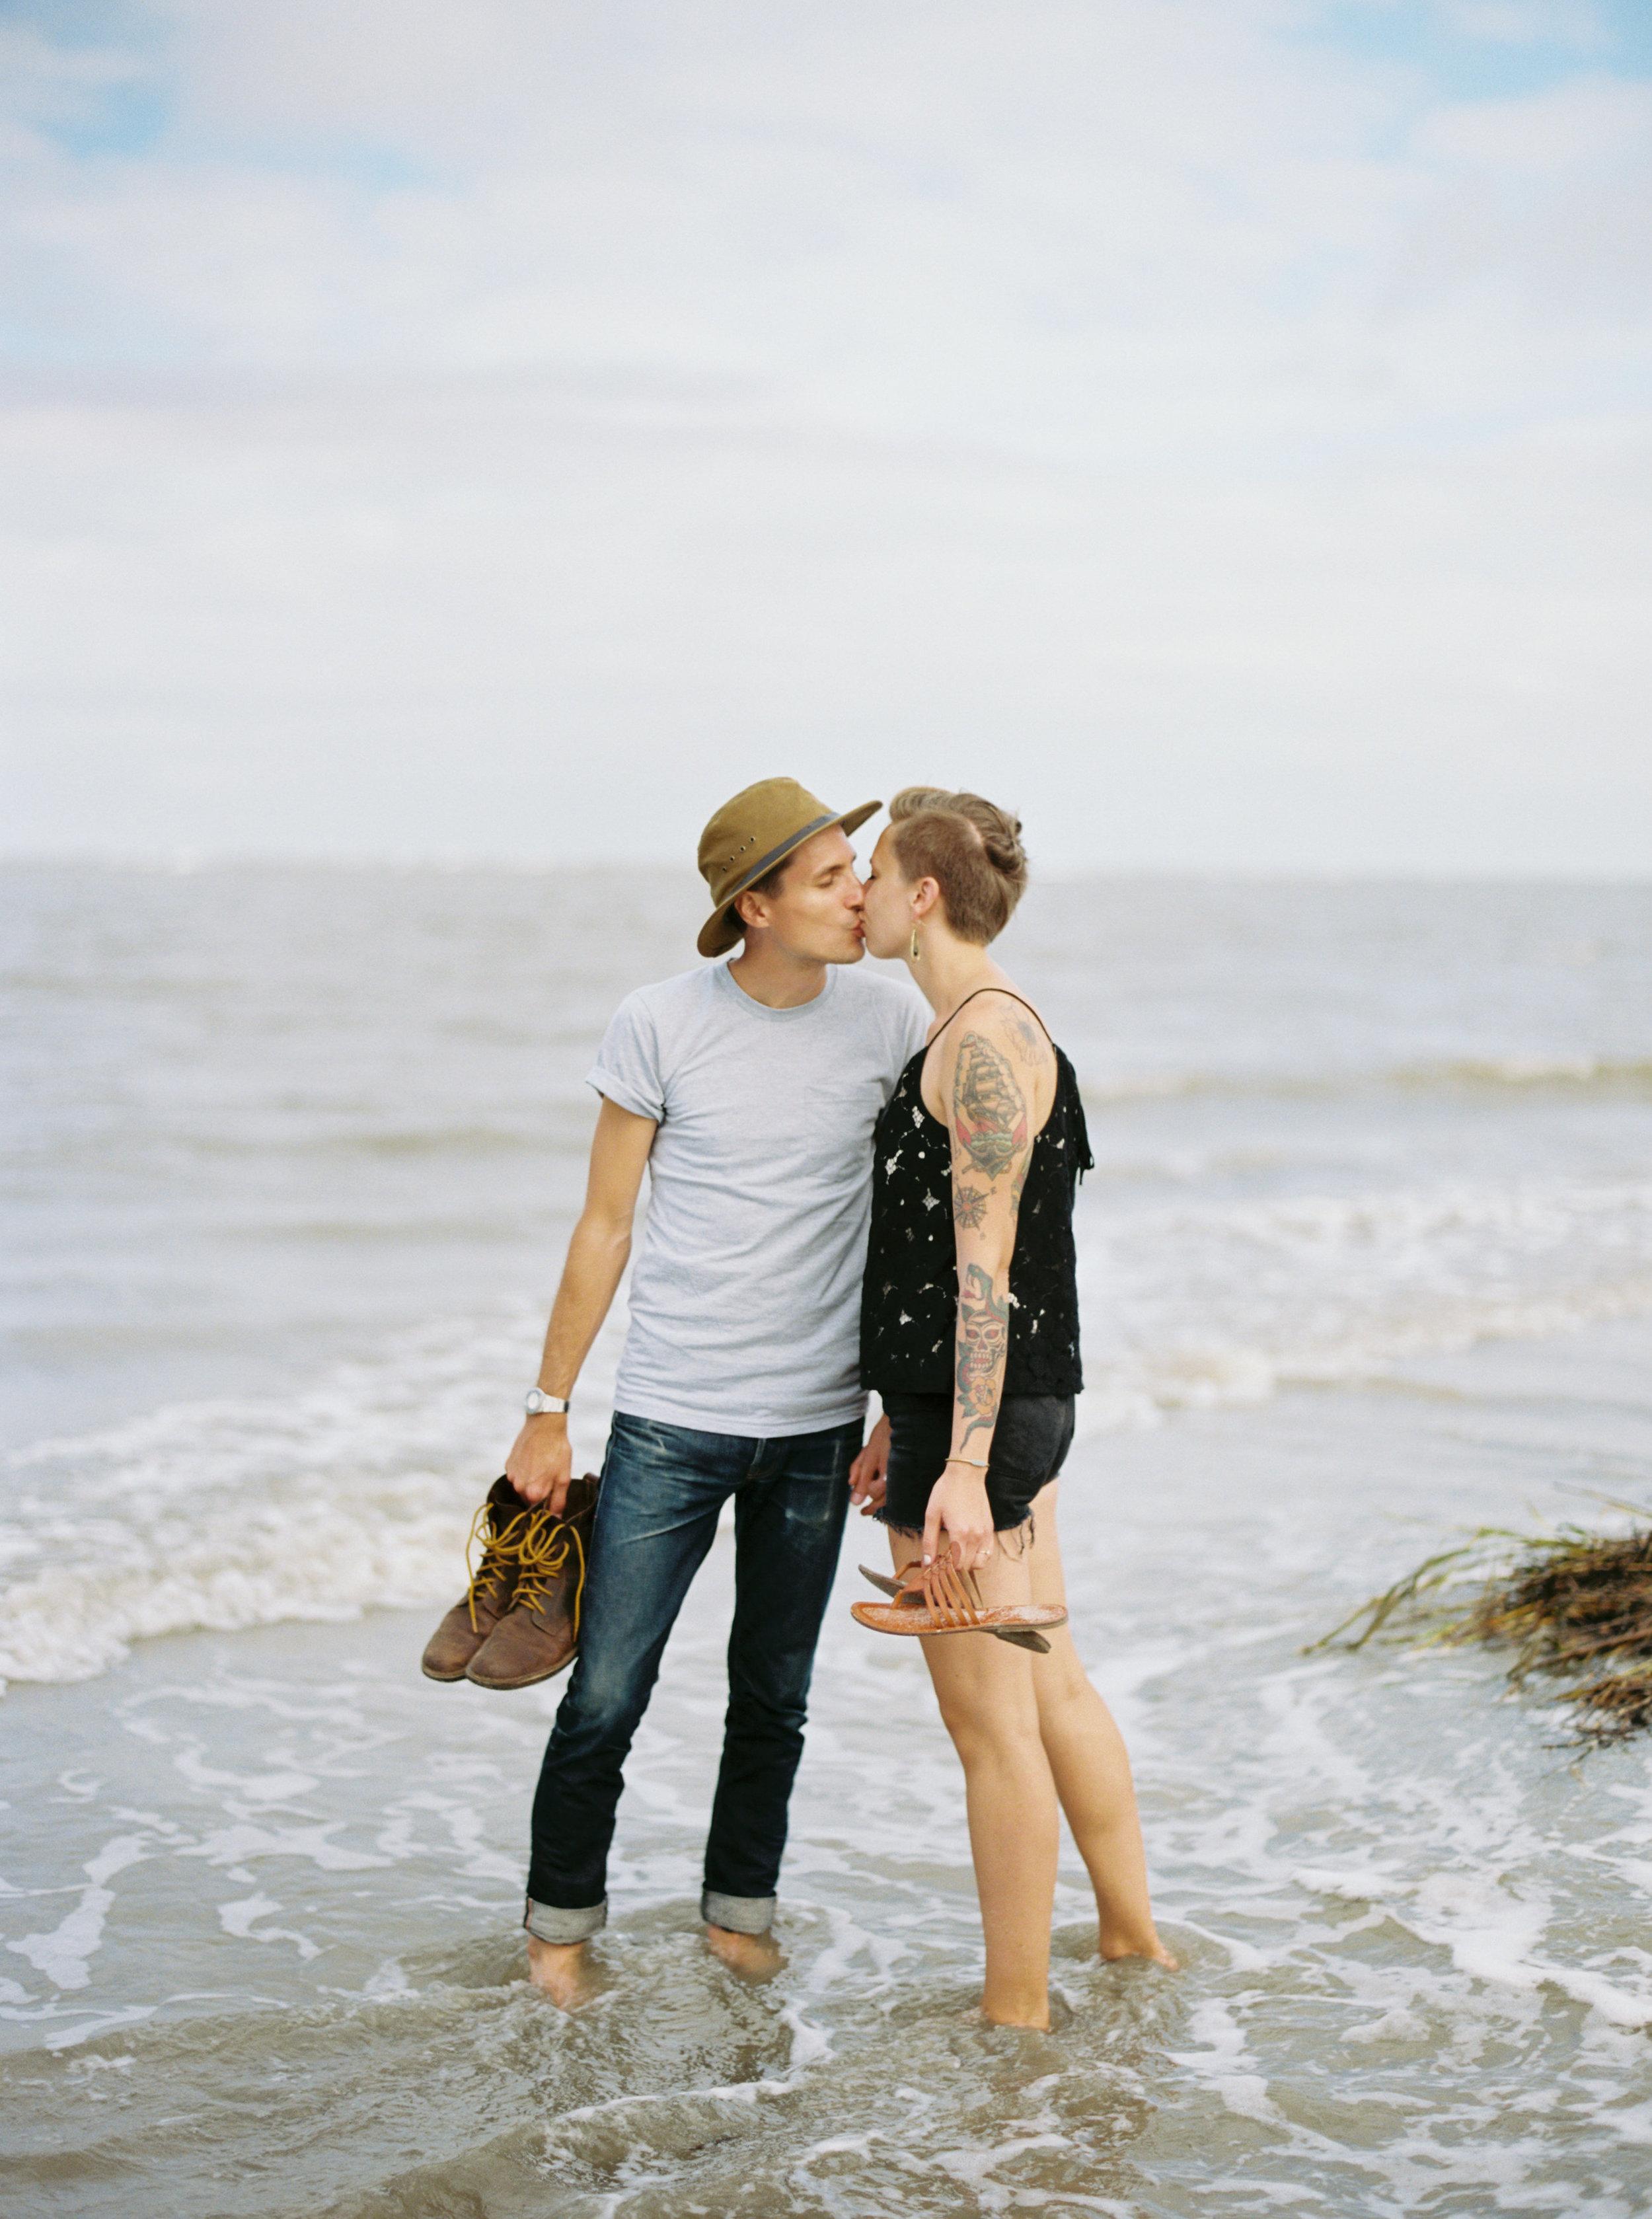 Kyle John l Fine Art Wedding Photography l Chicago, Copenhagen, California, New York, Destination l Blog l Emily & Evan_11